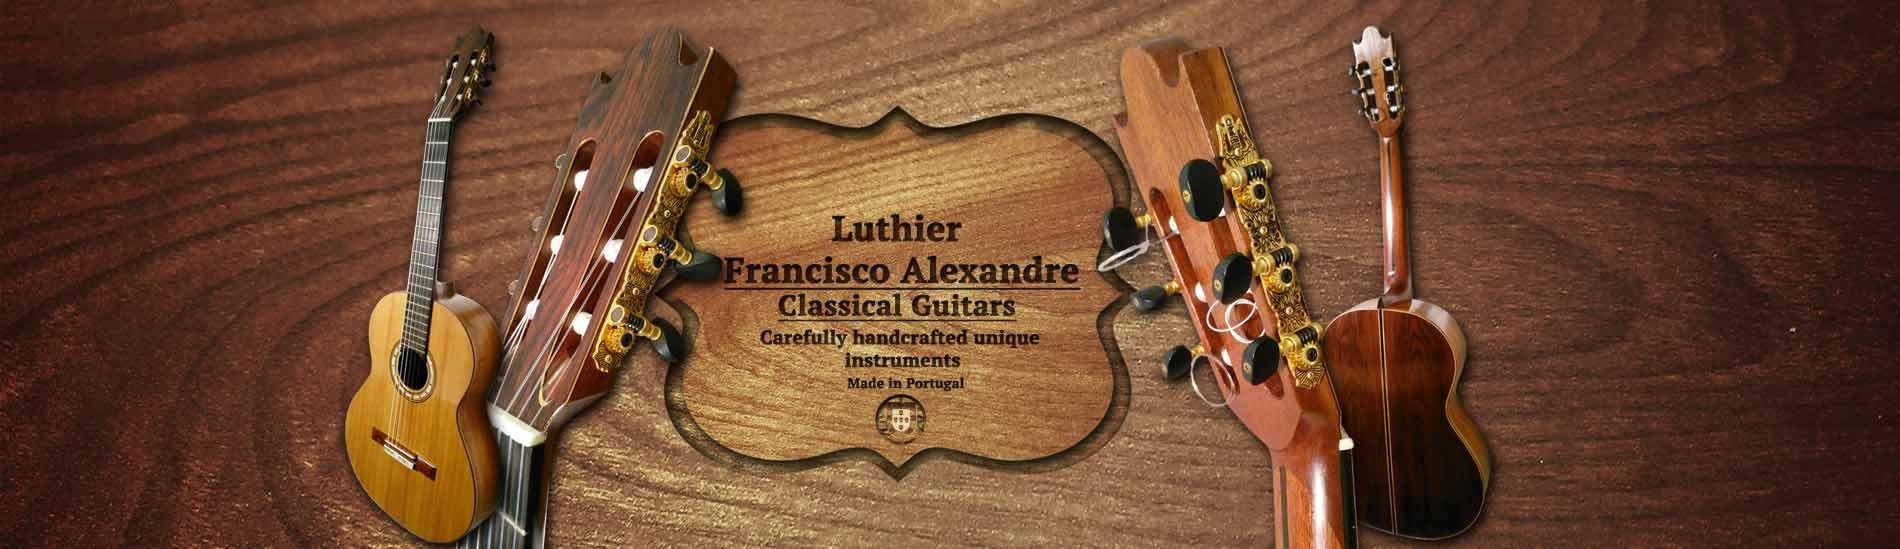 Luthier Francisco Alexandre guitar